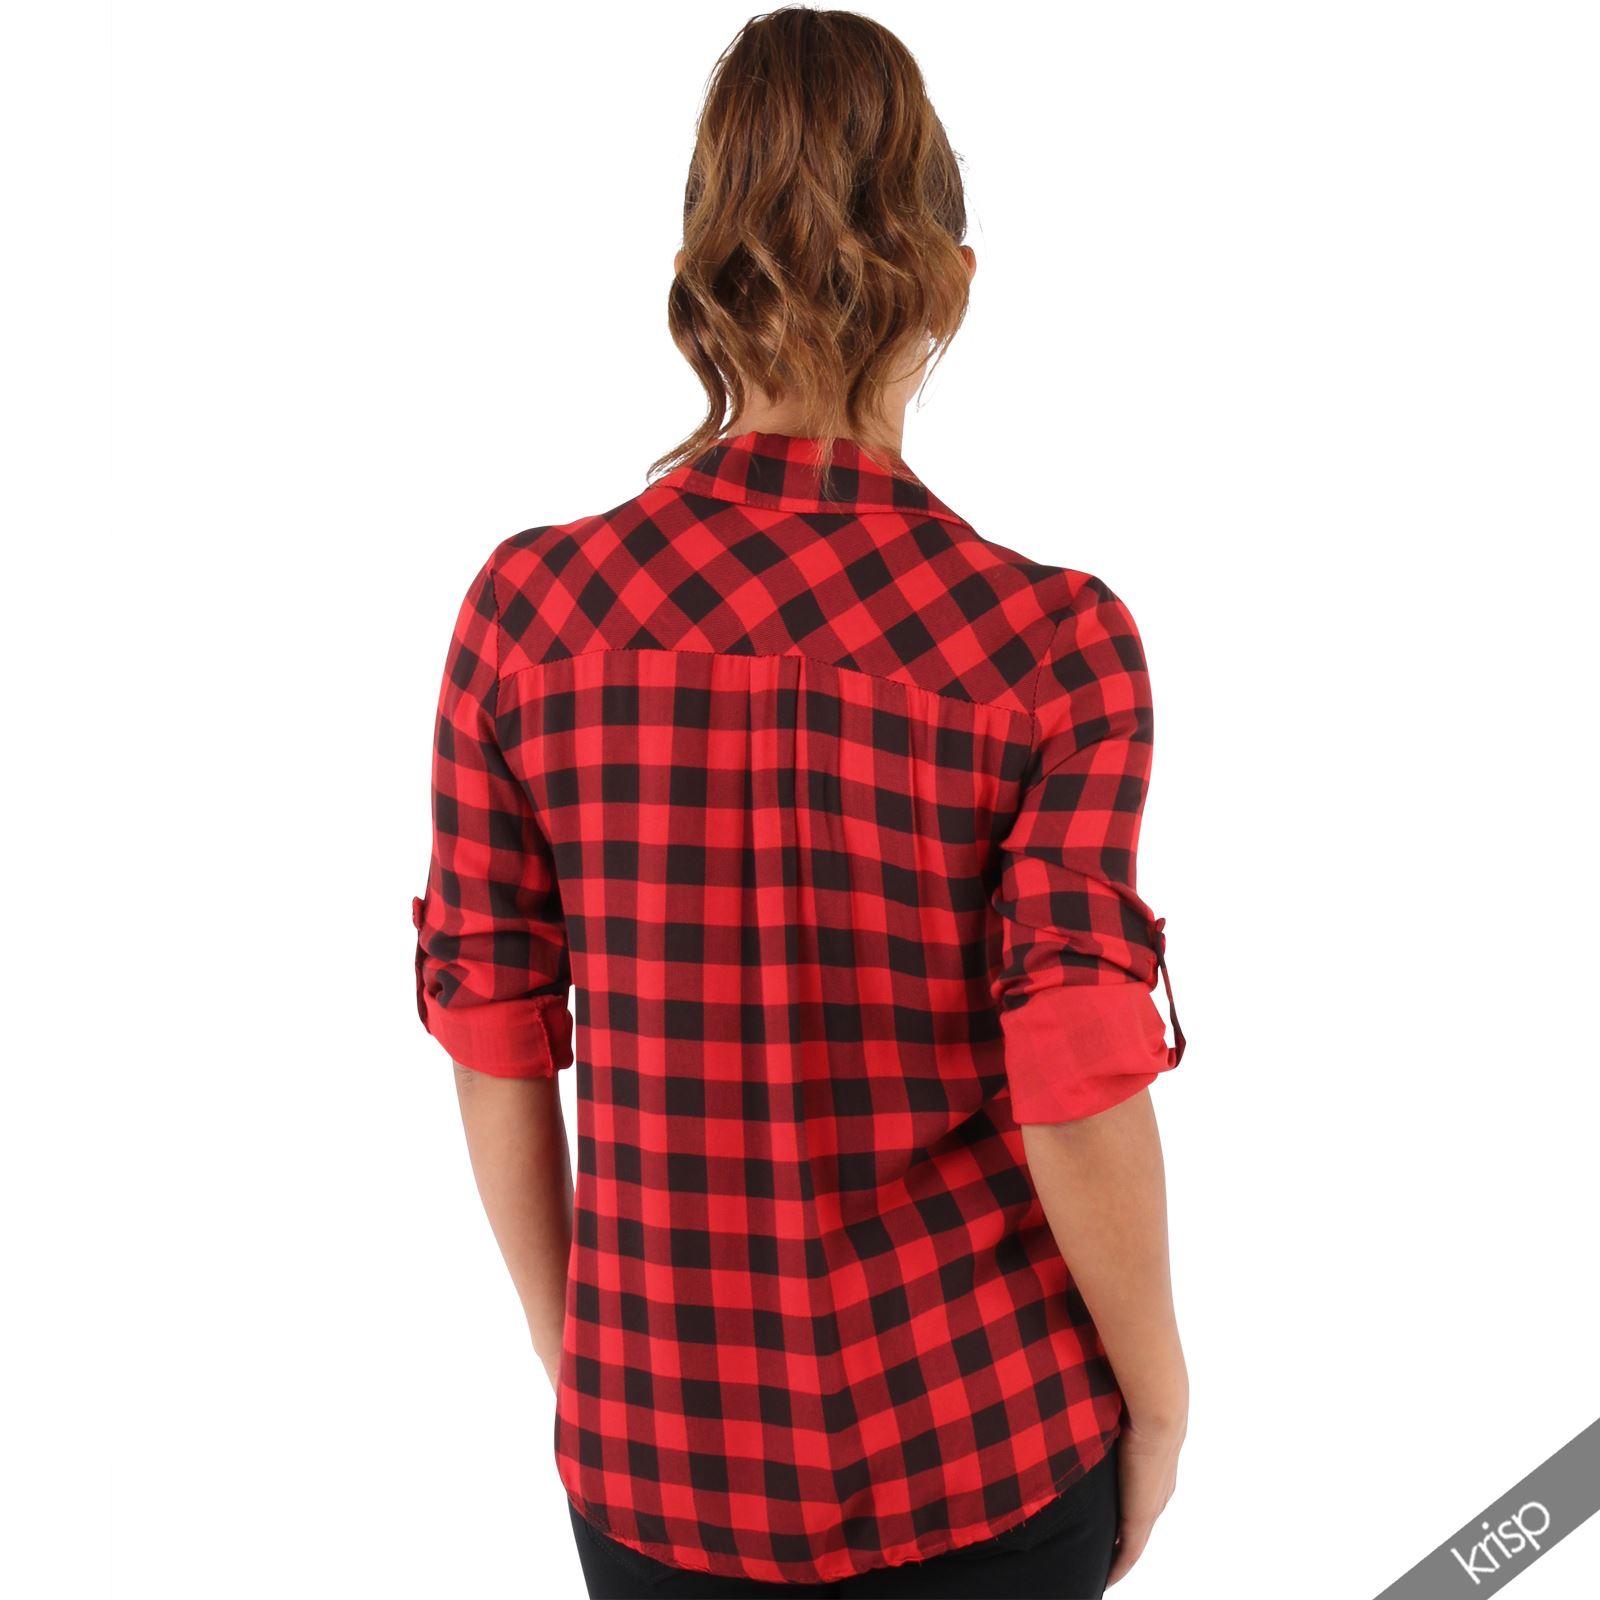 Womens lumberjack jacket